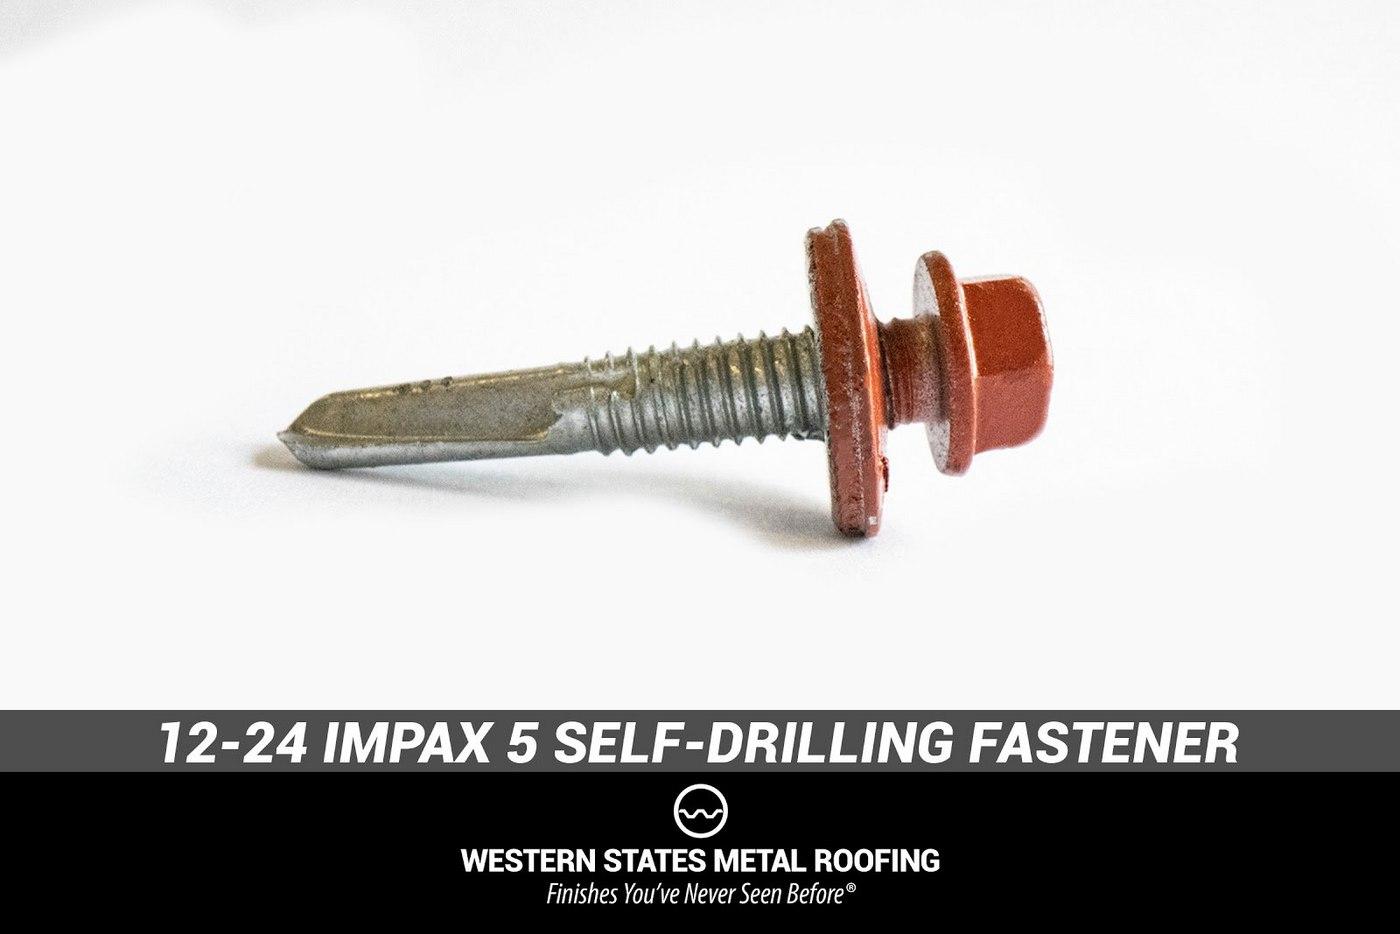 12-24 Impax 5 Self-Drilling Fastener